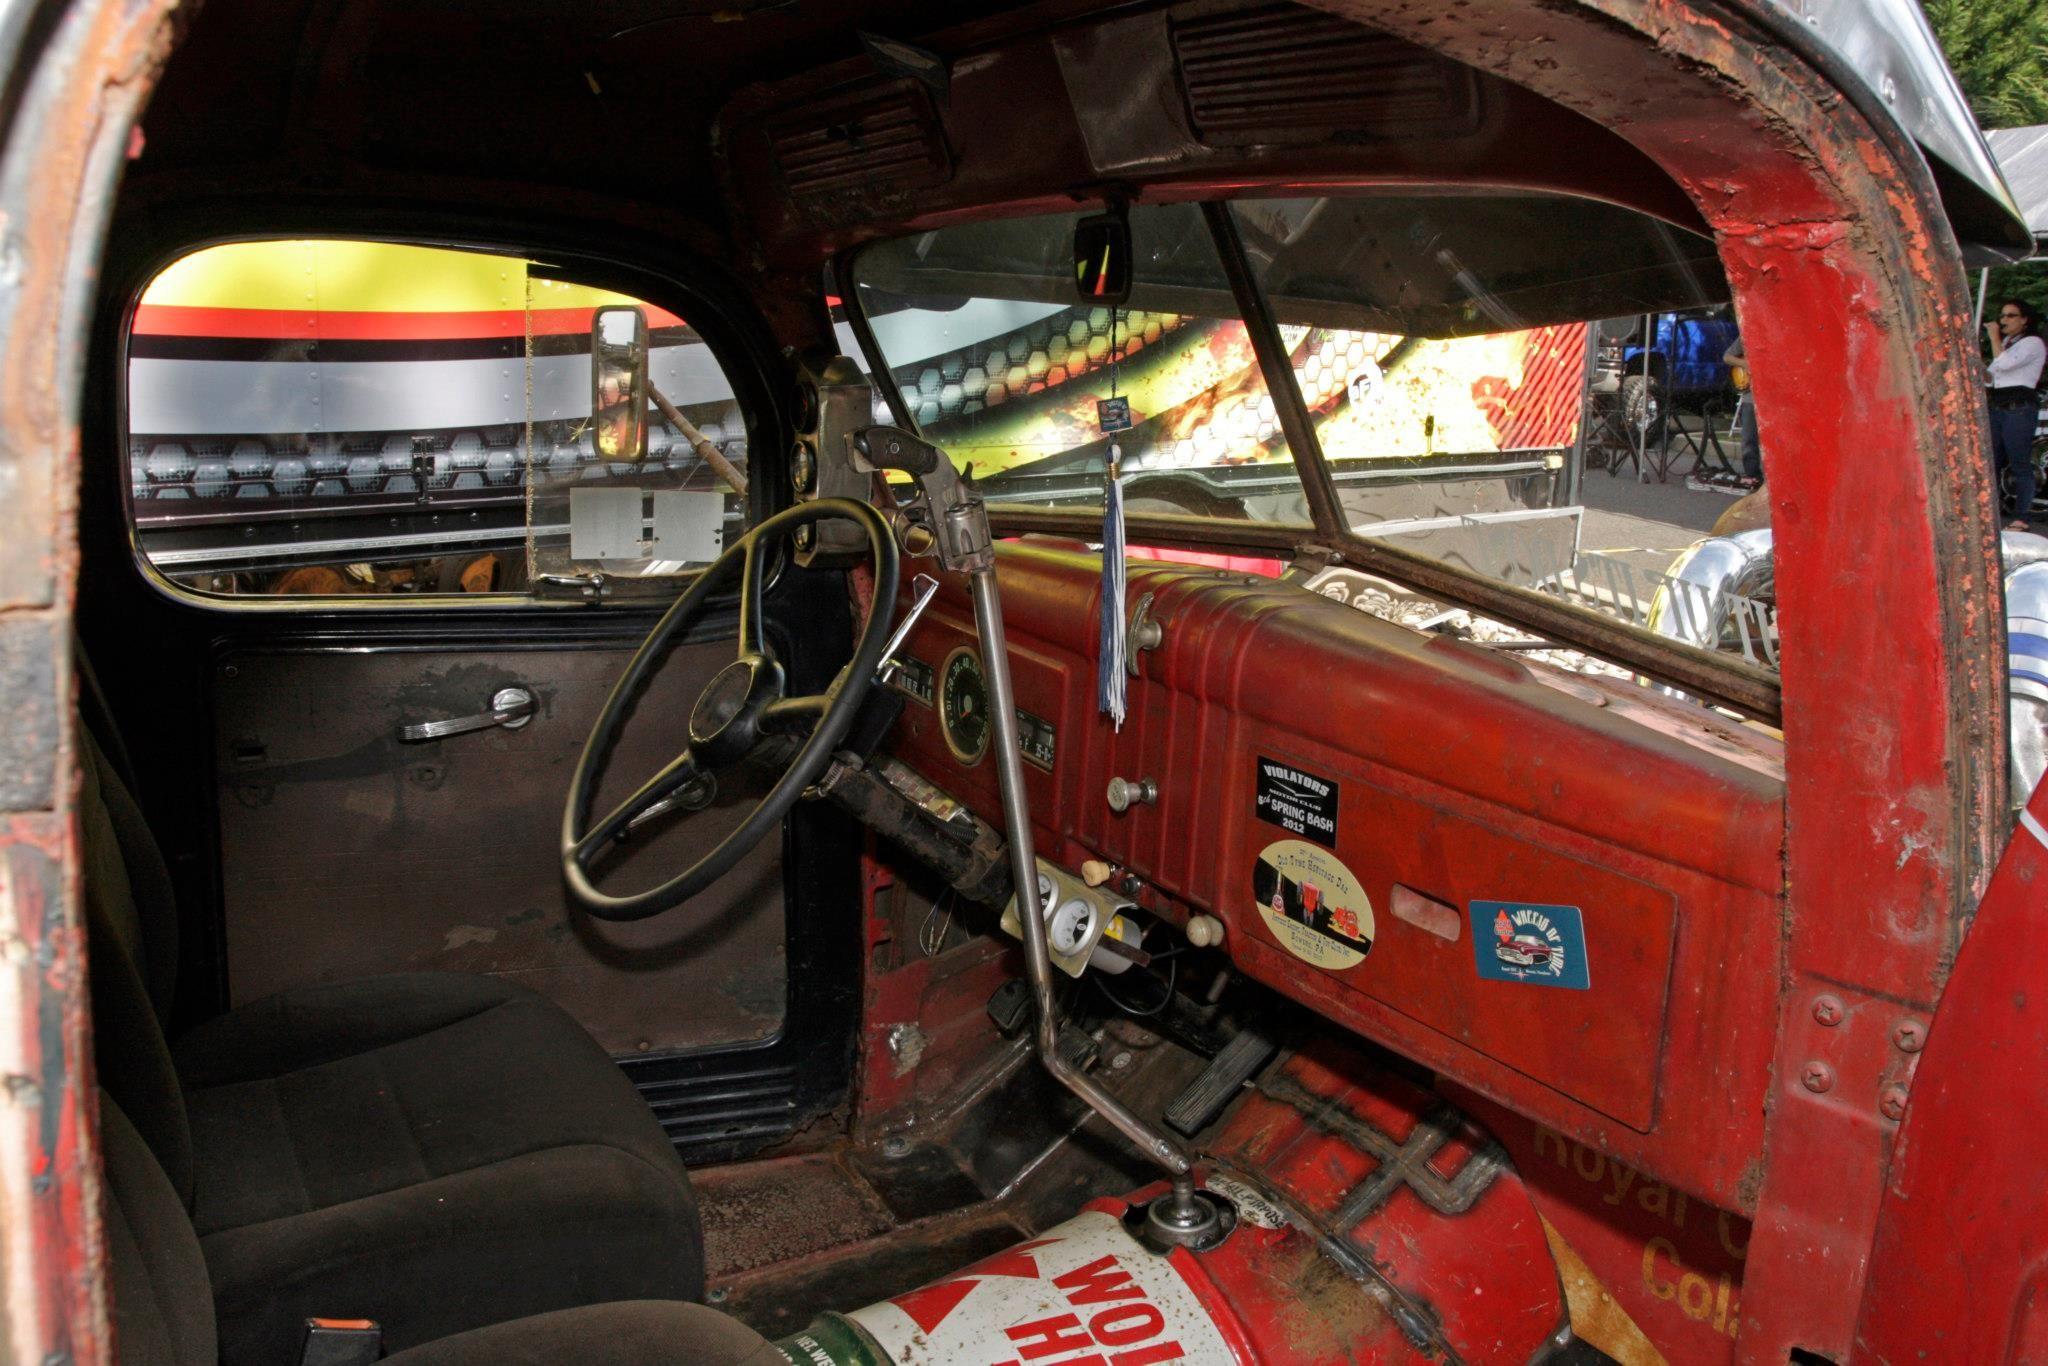 wtin turbo rat rod truck interior Muscle cars & hot rods